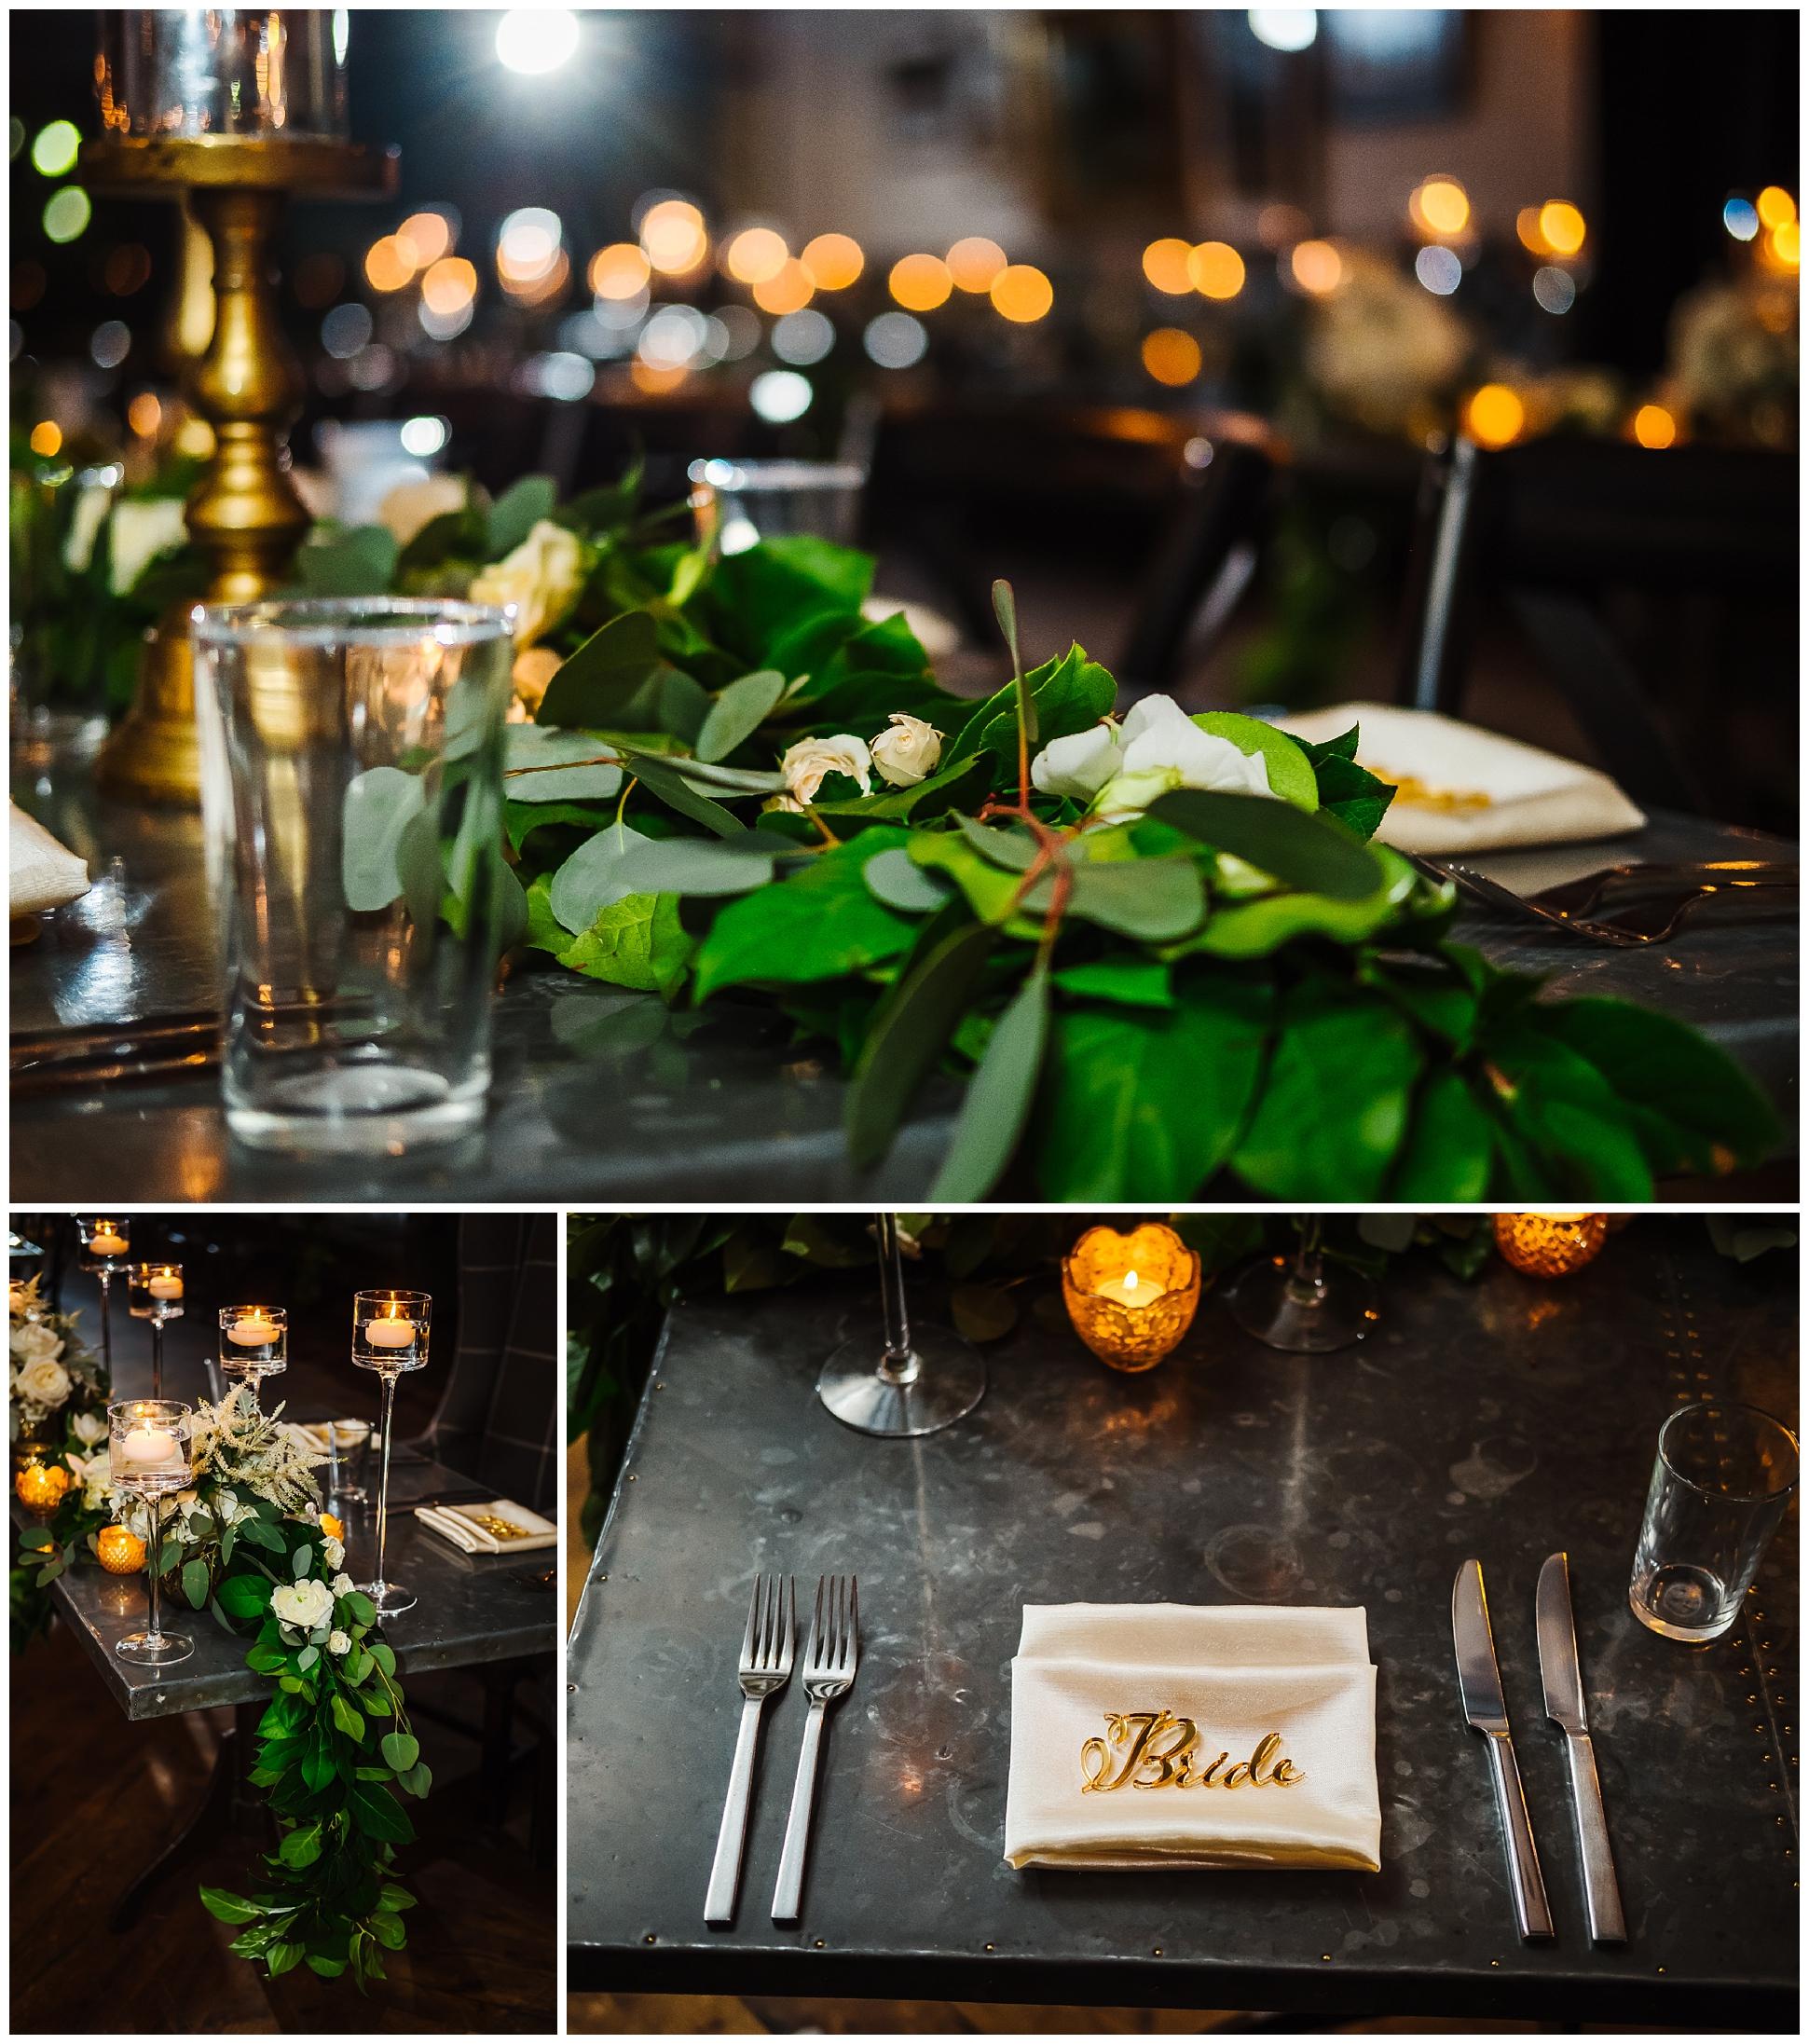 tampa-wedding-photographer-oxford-exchange-garland-candlelight-gold-hayley-paige_0051.jpg